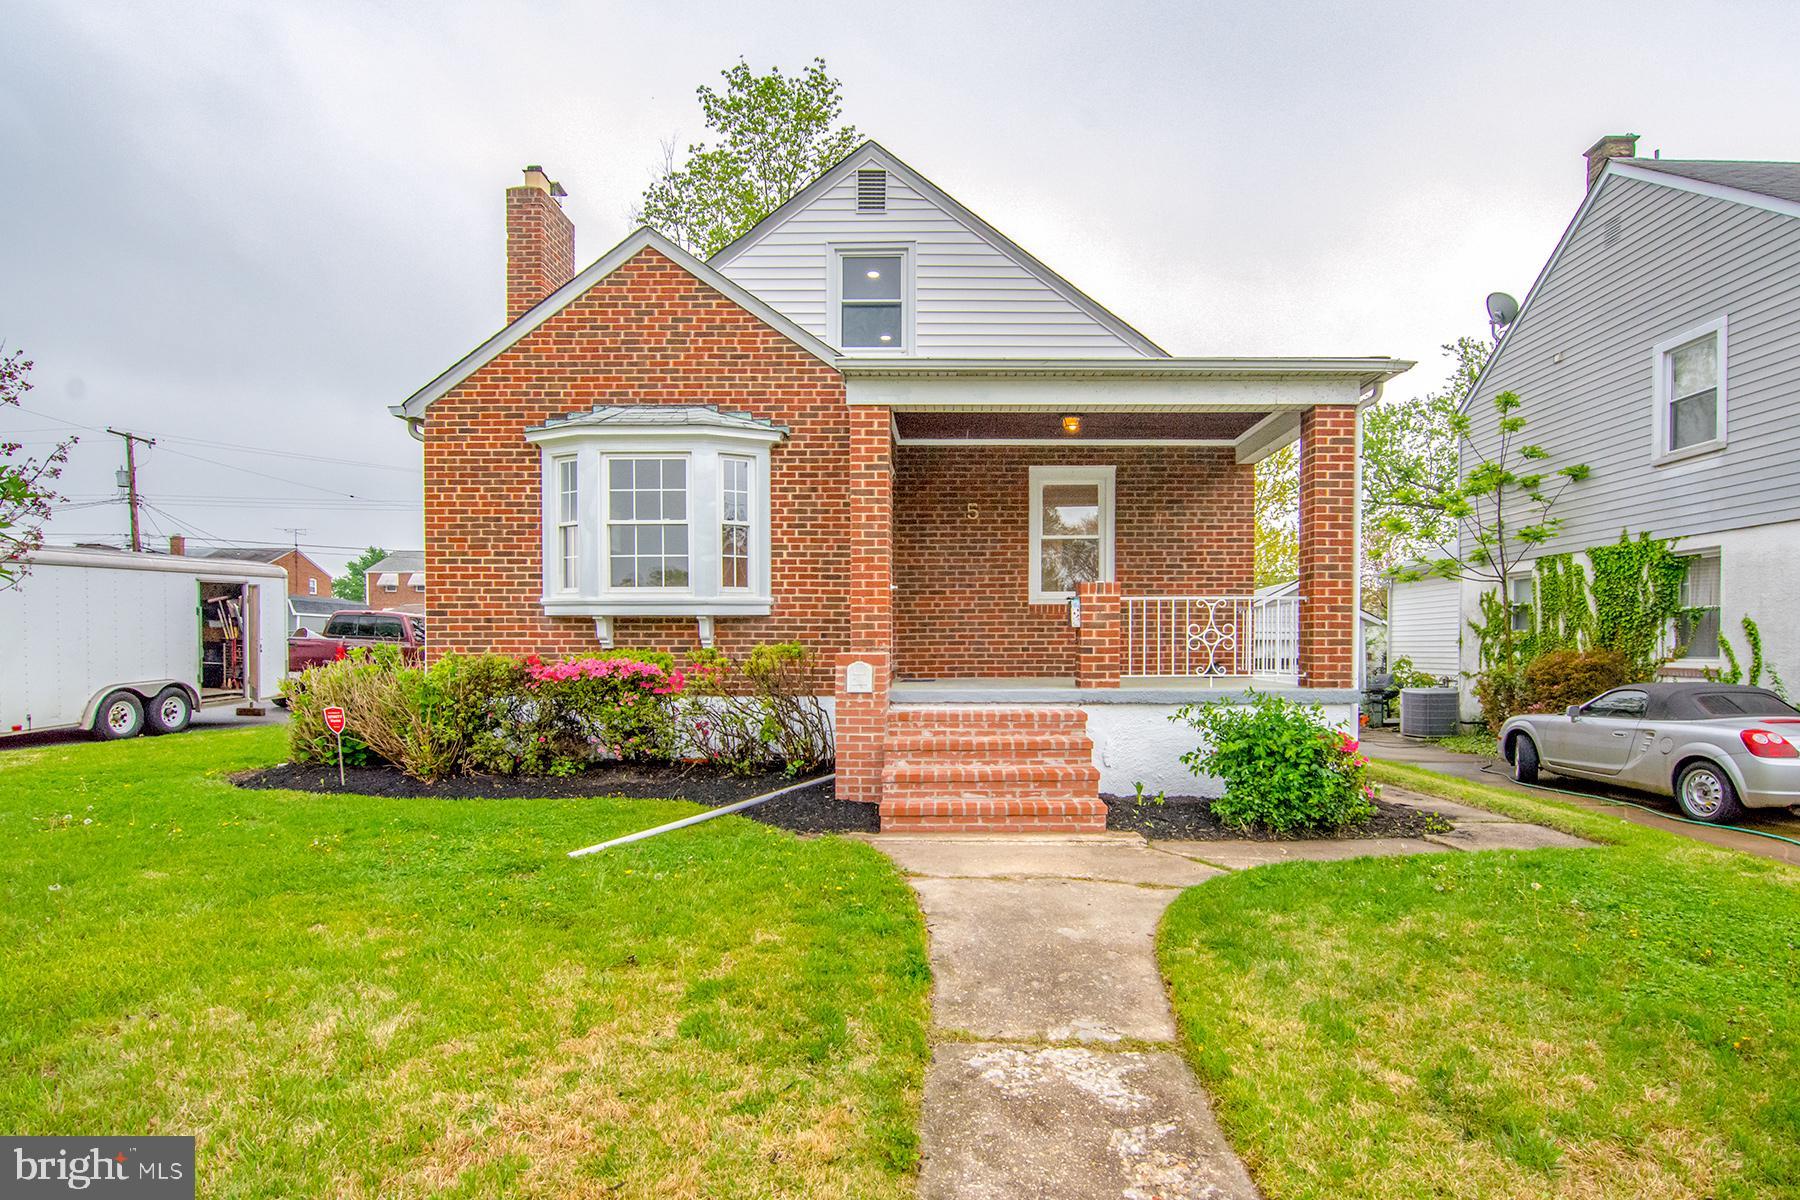 2019] [CALCULATOR] Estimated Buyer Closing Costs in Maryland